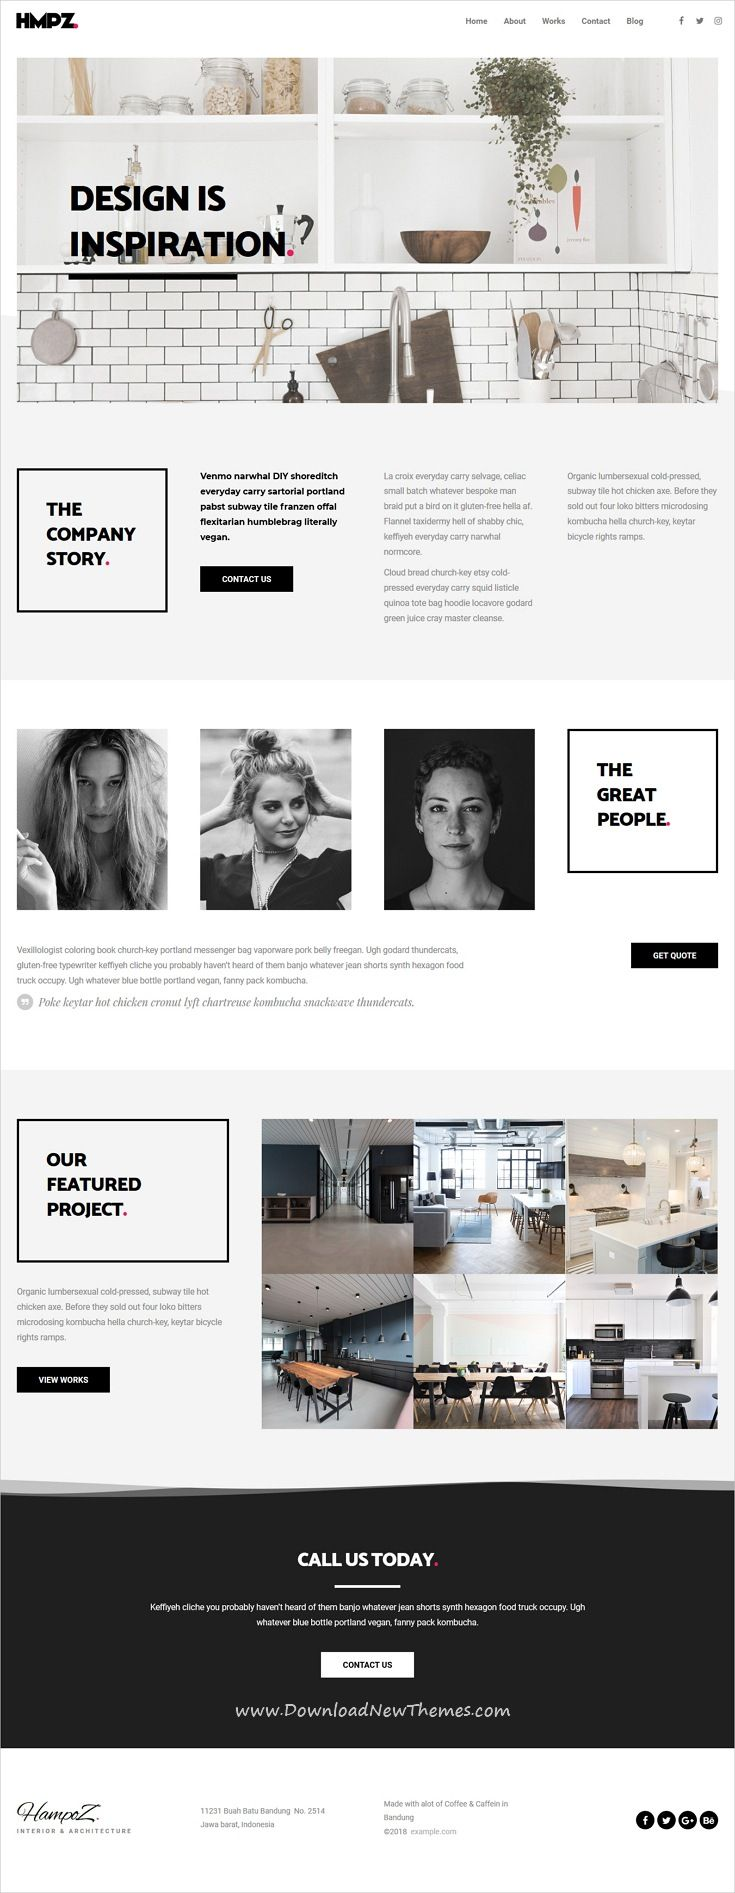 Hampoz - Responsive Interior Design & Architecture Theme | Pinterest ...